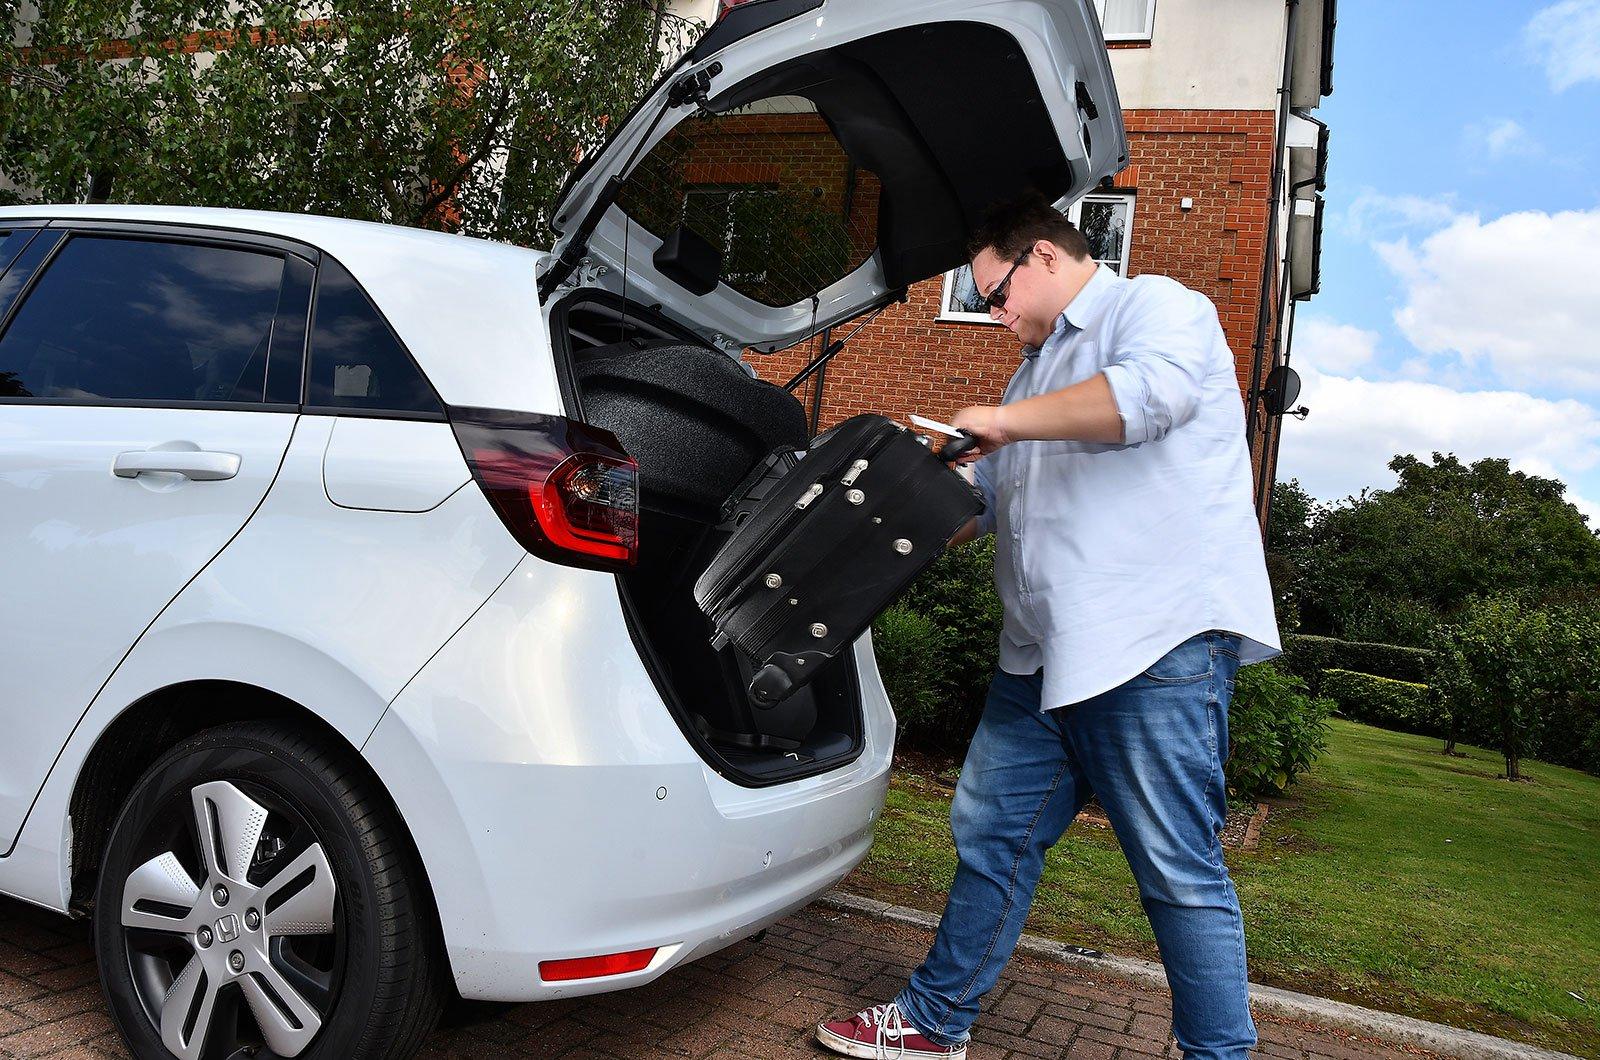 Honda Jazz with suitcases